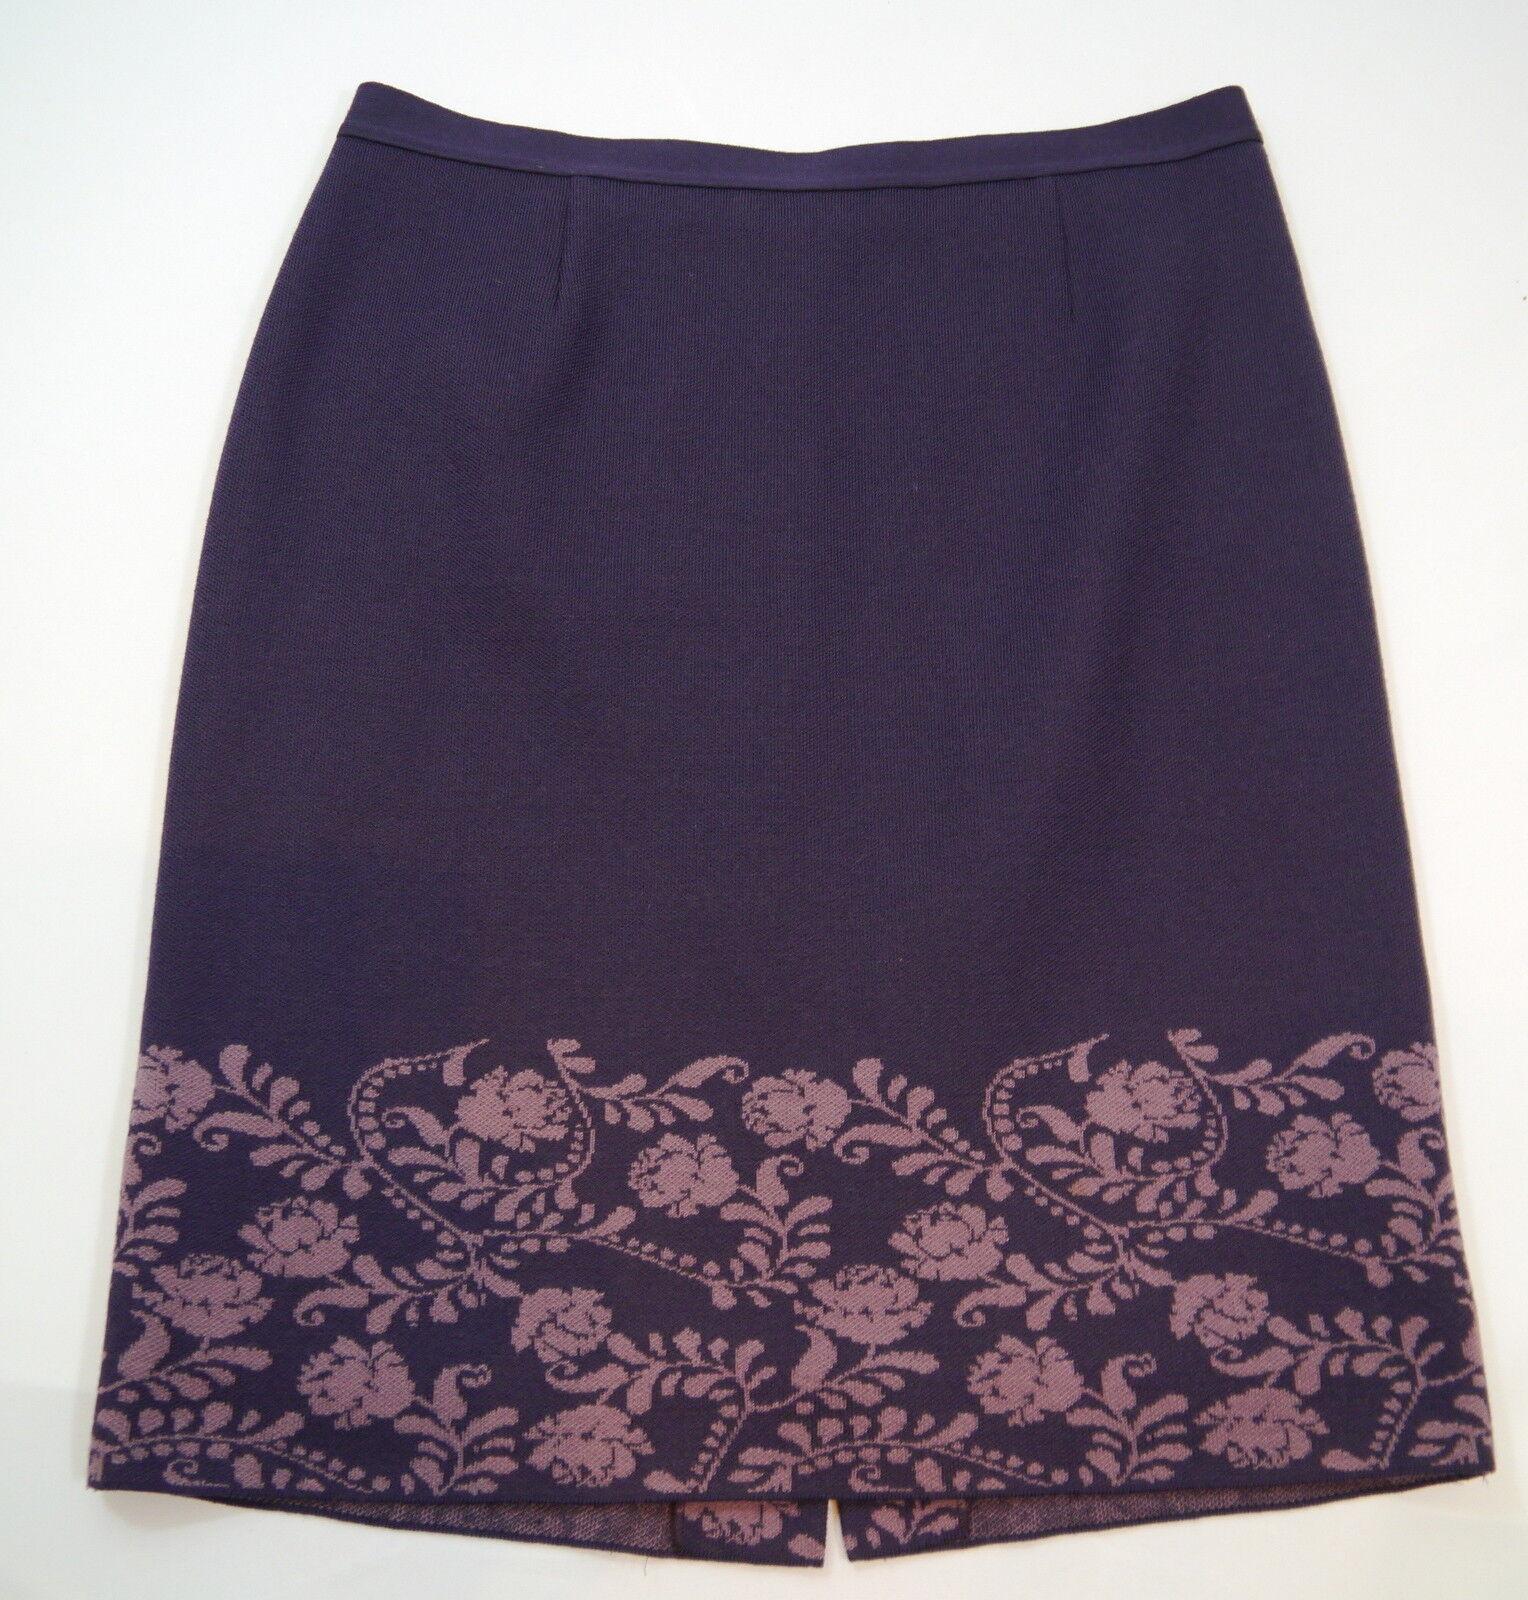 damen Stretchrock  LUISA SPAGNOLI Wolle lila Bordüre Ornamente Gr.L WIE NEU